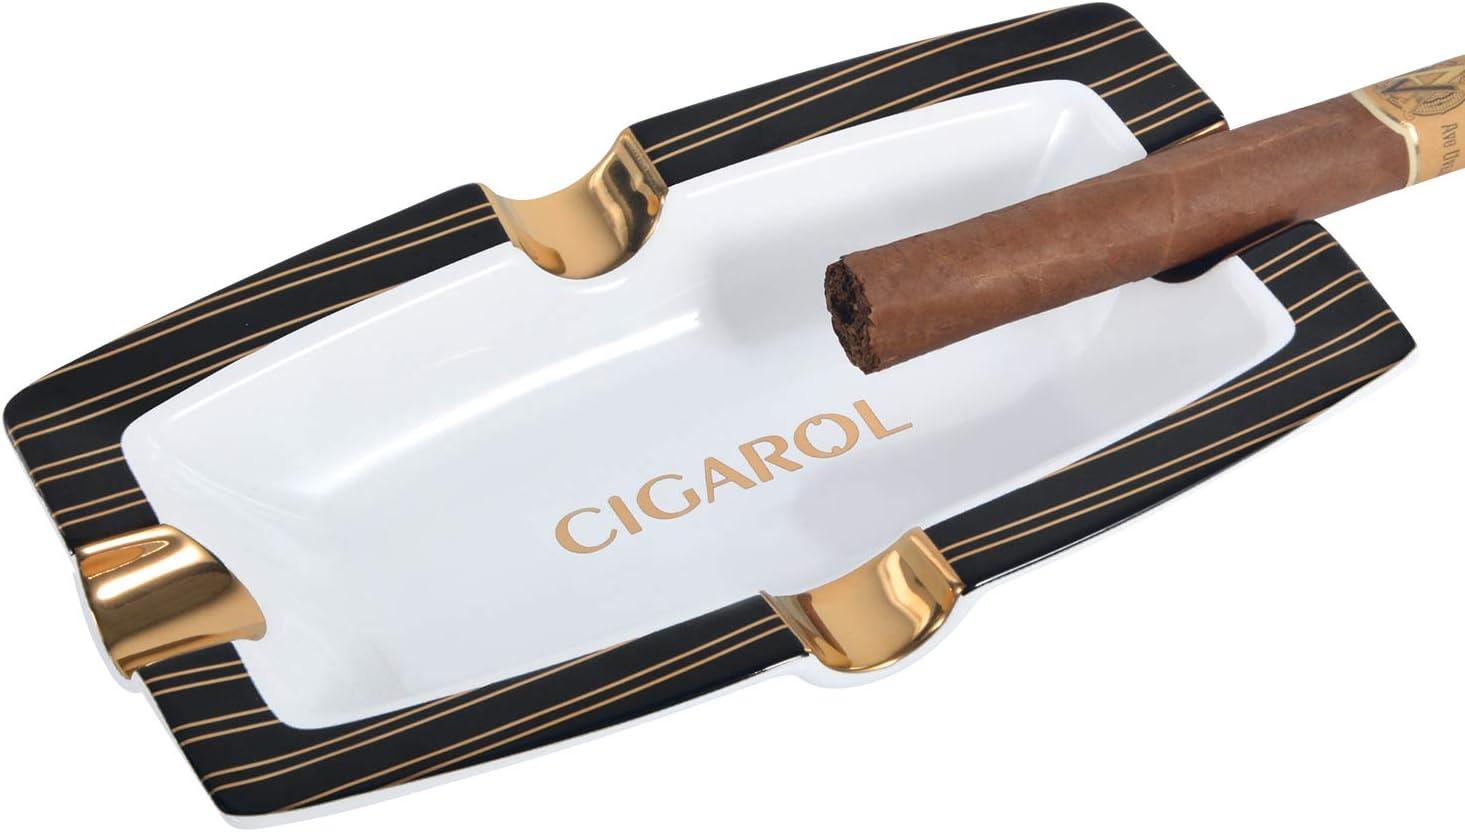 Cigar Ashtray, Ceramic Ash Tray, 4 Slots Cigar Rest Holder, Indoor Outdoor Desktop Ash Holder for Smokers, Cigar Accessories for Indoor, Outdoor, Patio, Home, Office Use